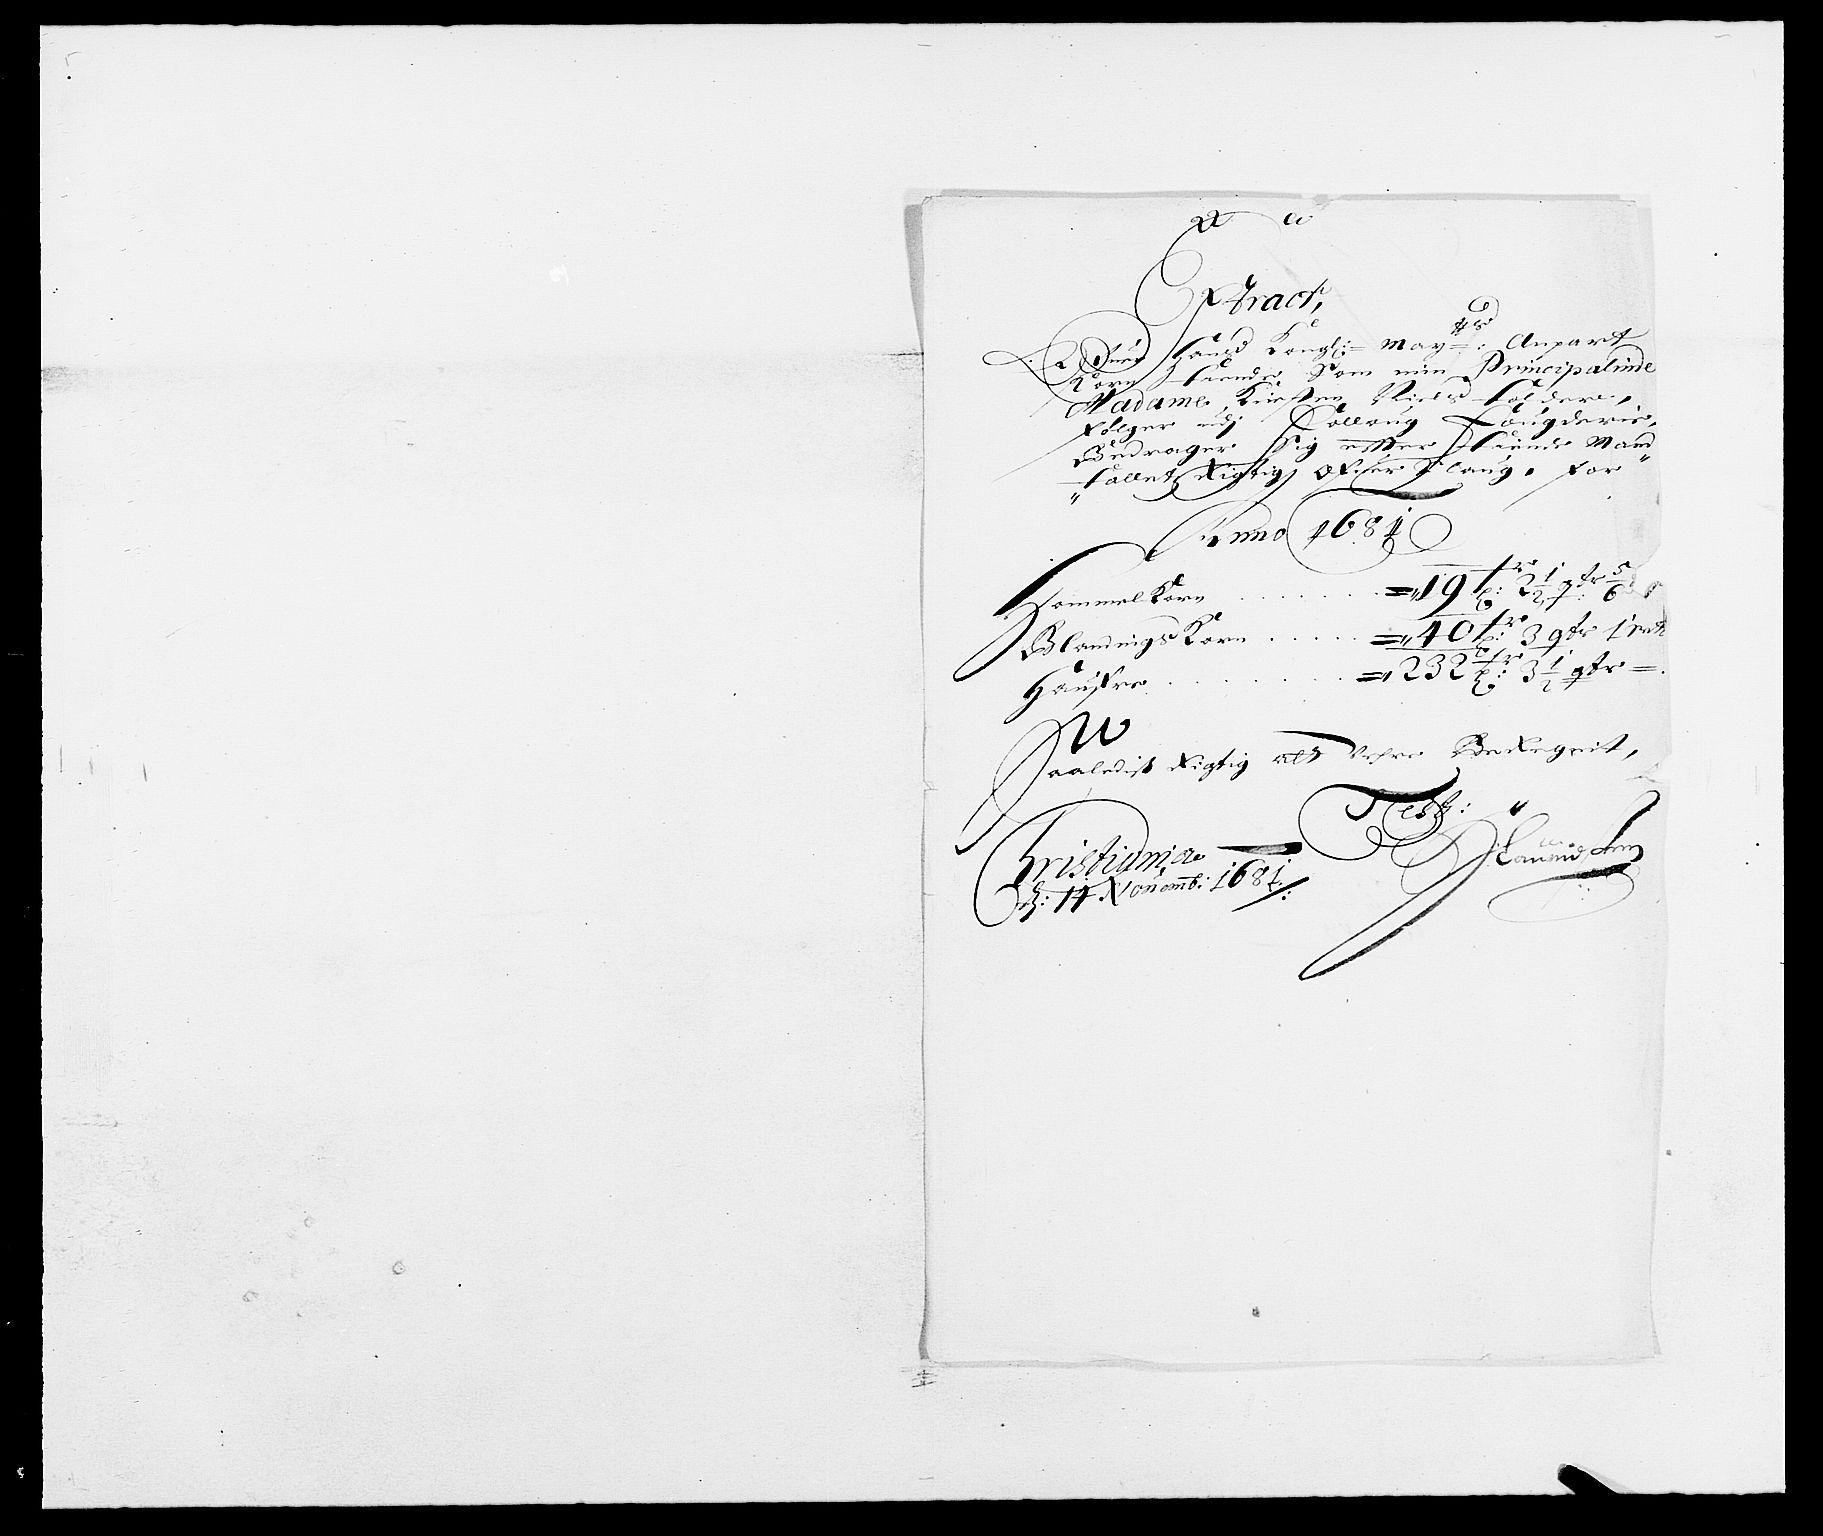 RA, Rentekammeret inntil 1814, Reviderte regnskaper, Fogderegnskap, R09/L0429: Fogderegnskap Follo, 1680-1681, s. 379